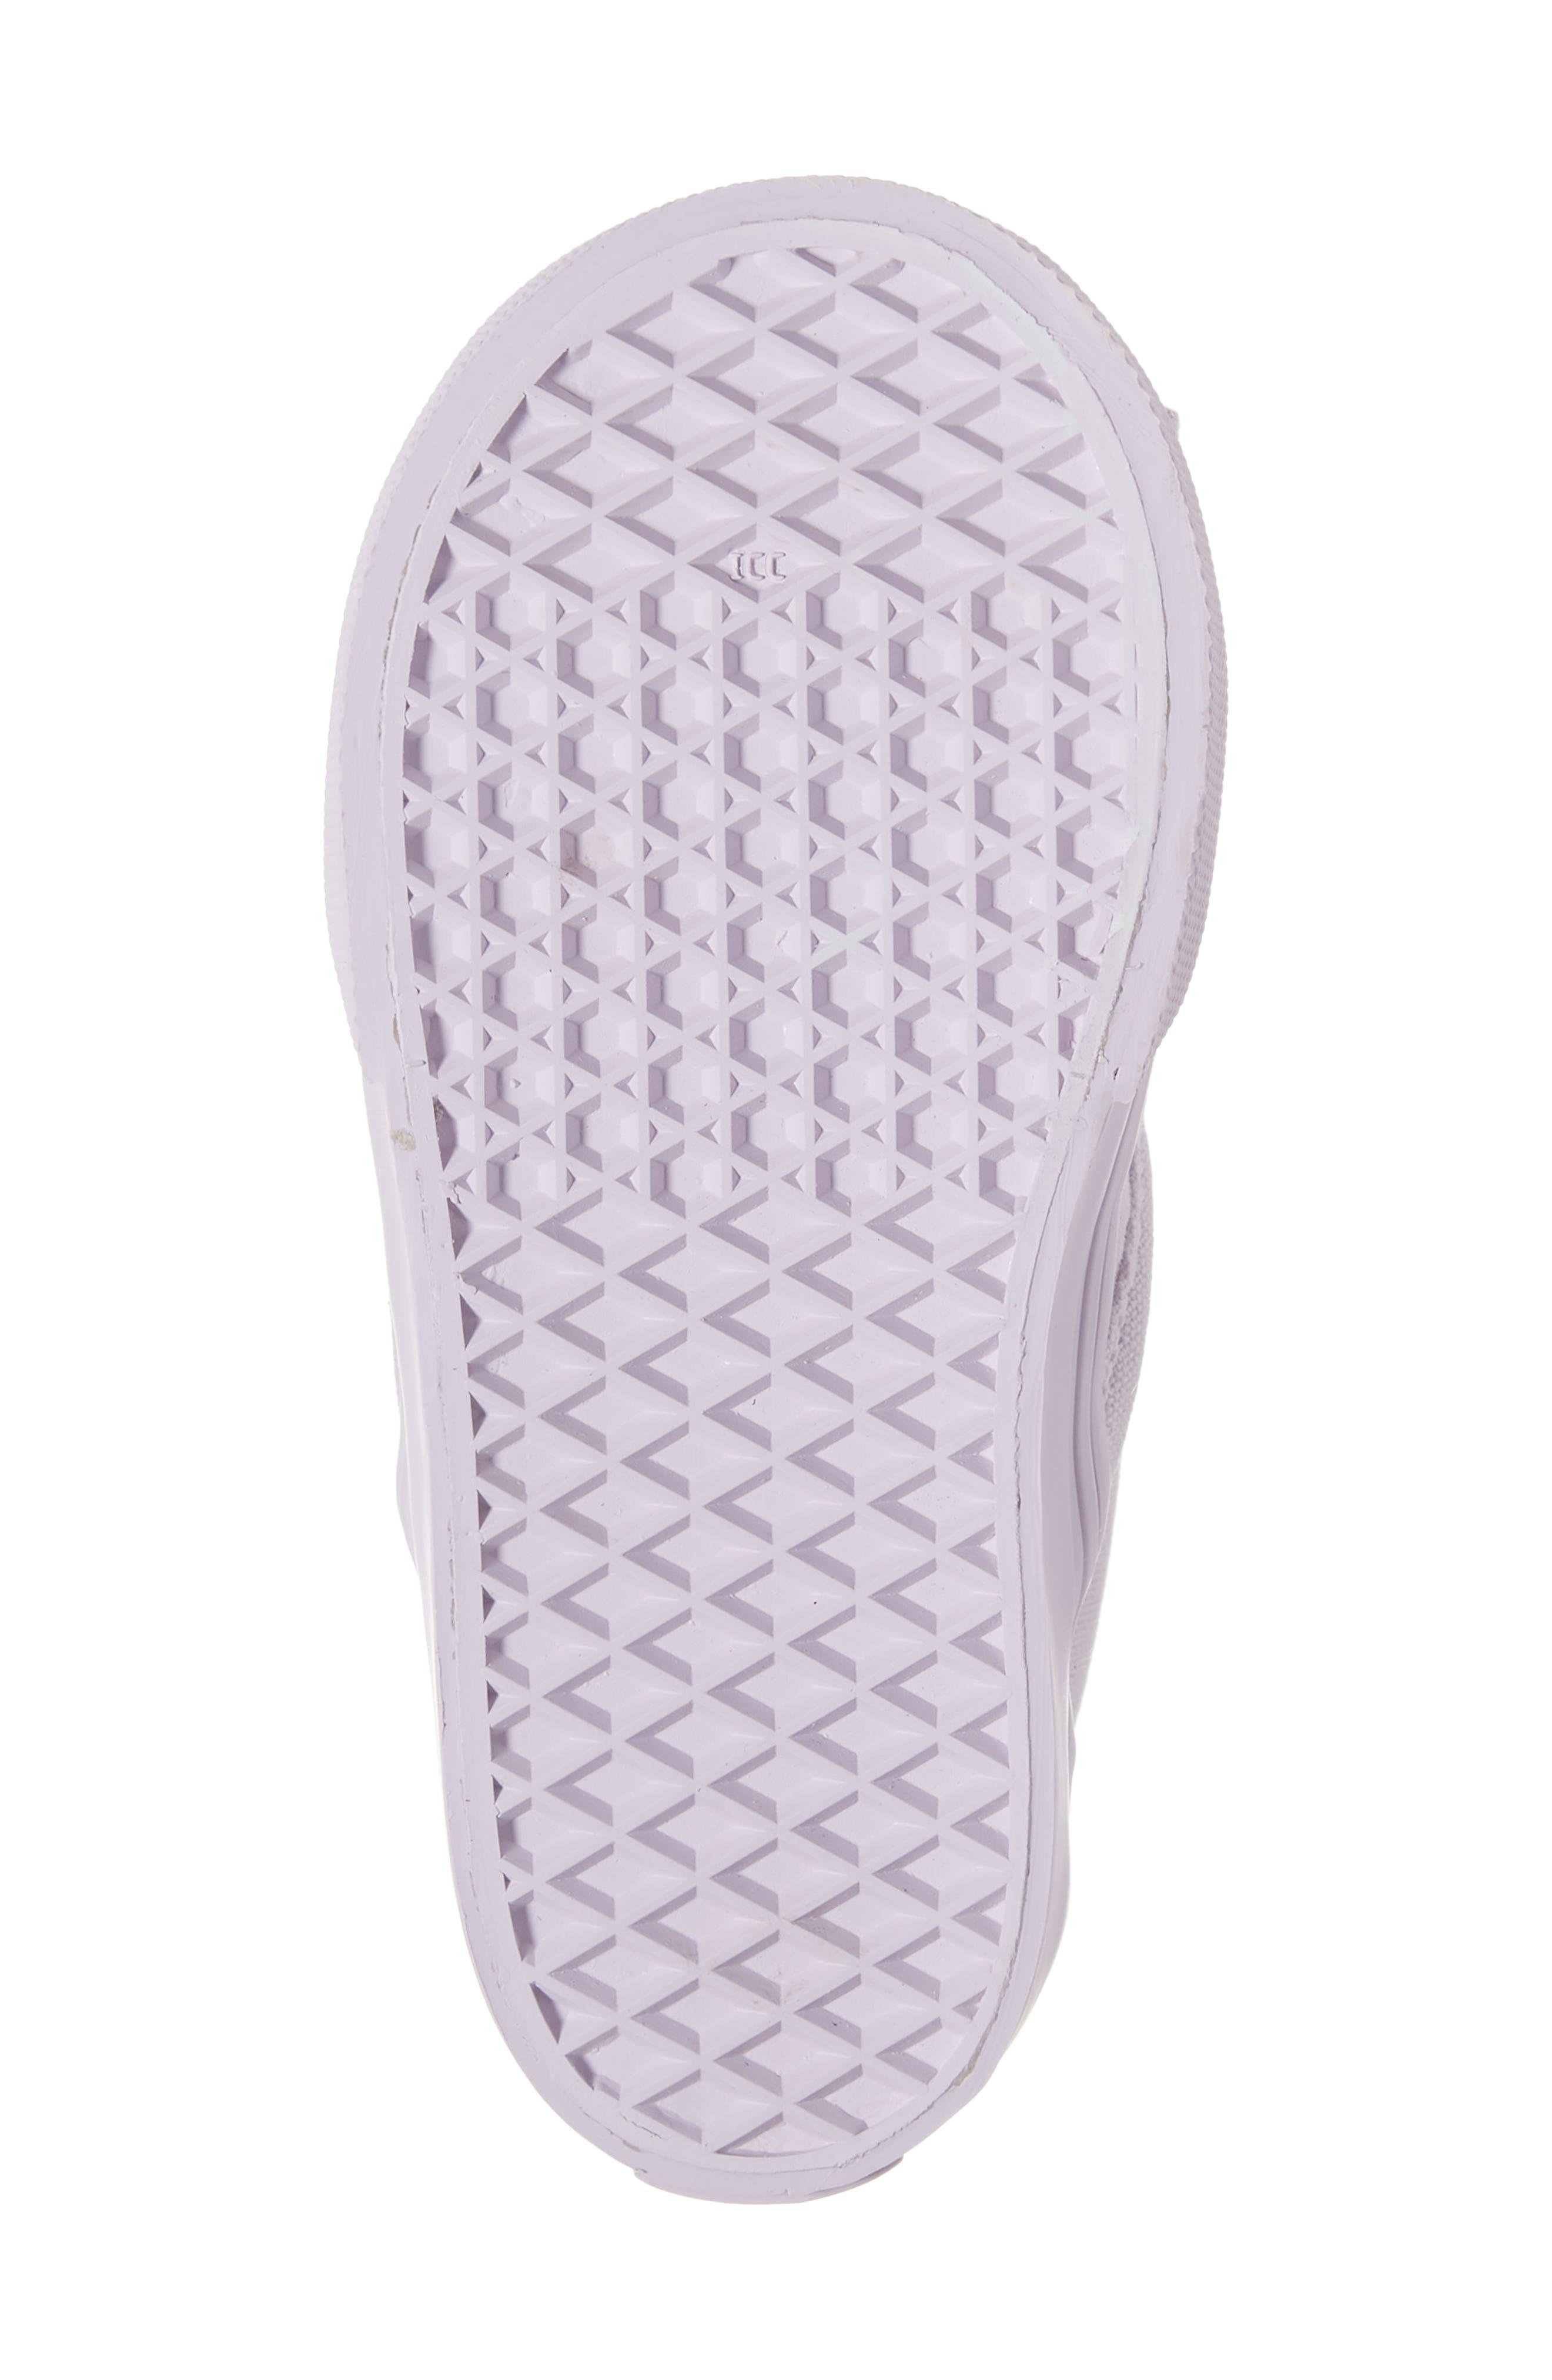 Ruffle Classic Slip-On Sneaker,                             Alternate thumbnail 6, color,                             530